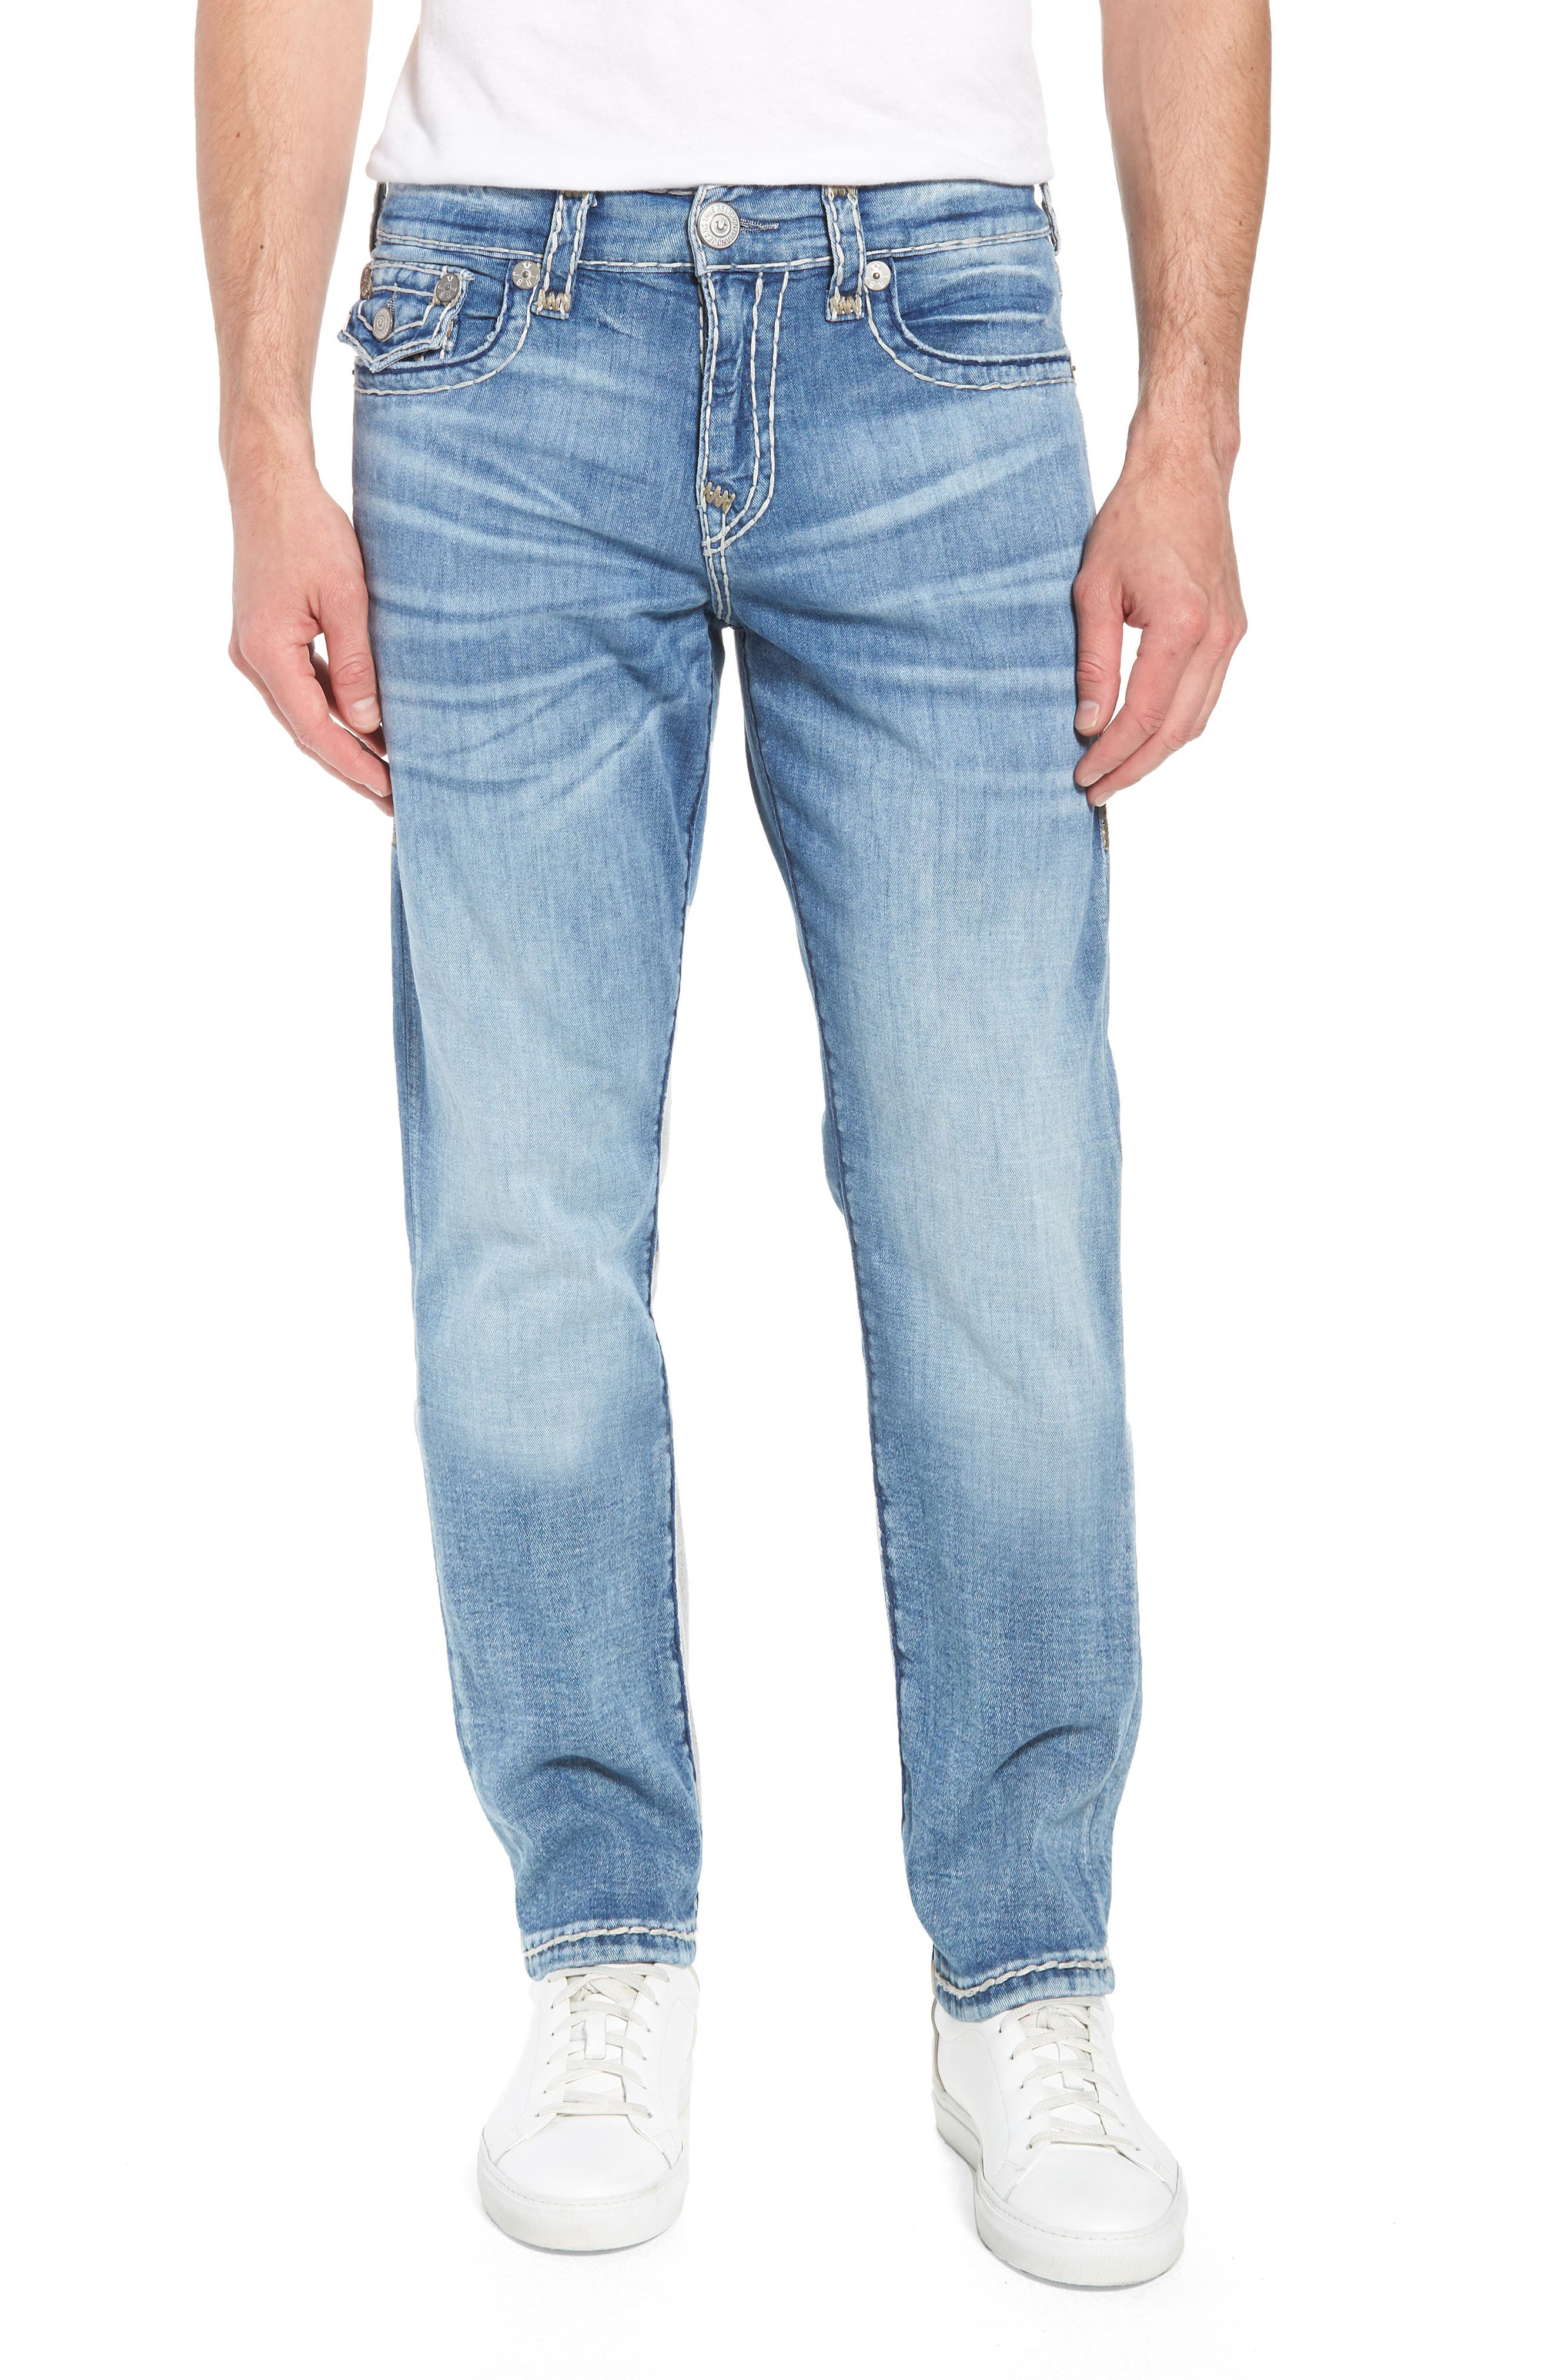 Geno Straight Leg Jeans,                             Main thumbnail 1, color,                             Satellite